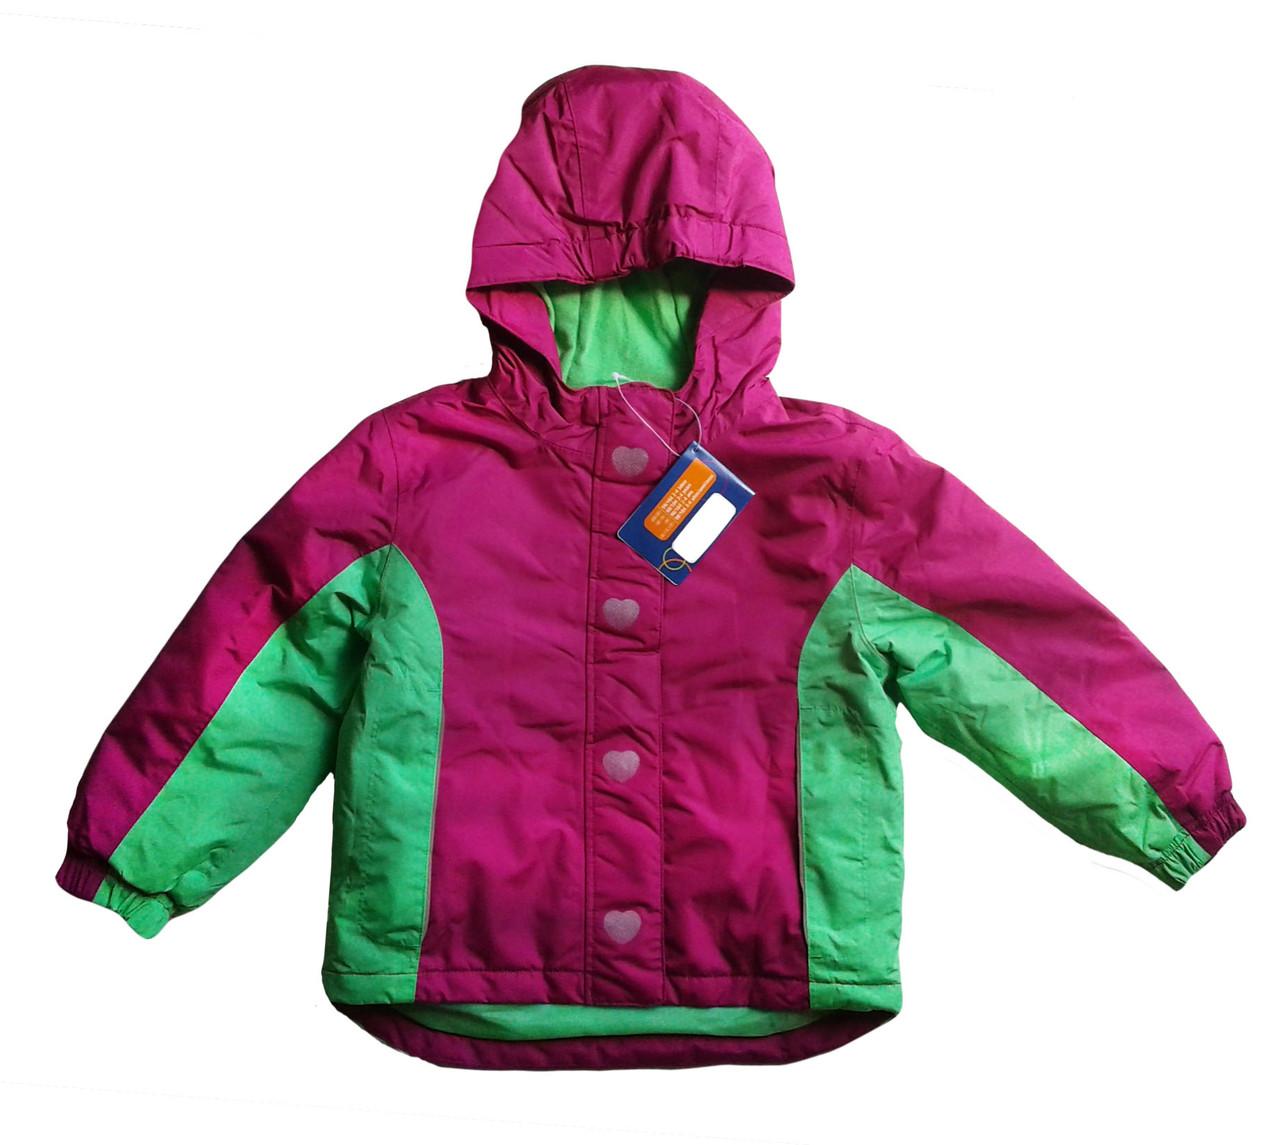 Куртка  для девочки, Lupilu, размер 98/104, арт. Л-425